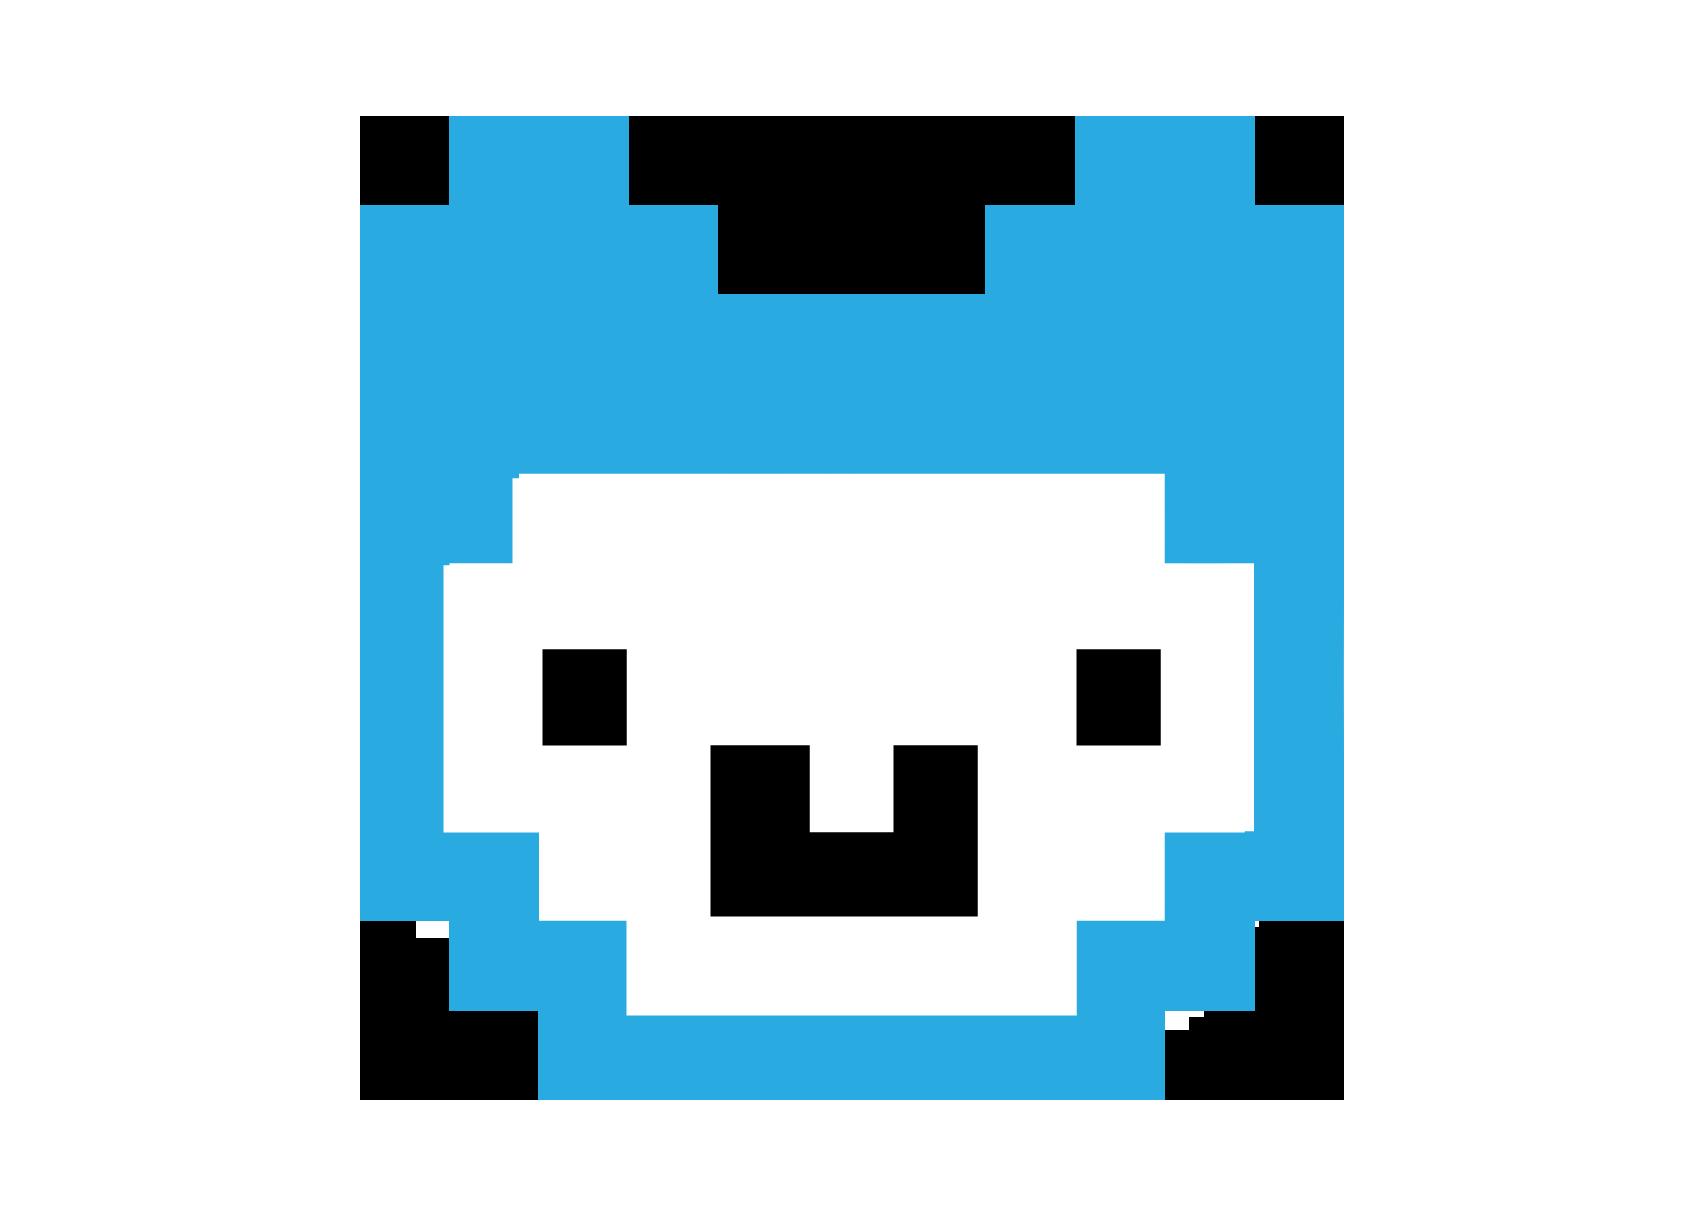 Jugendhackt-avatar